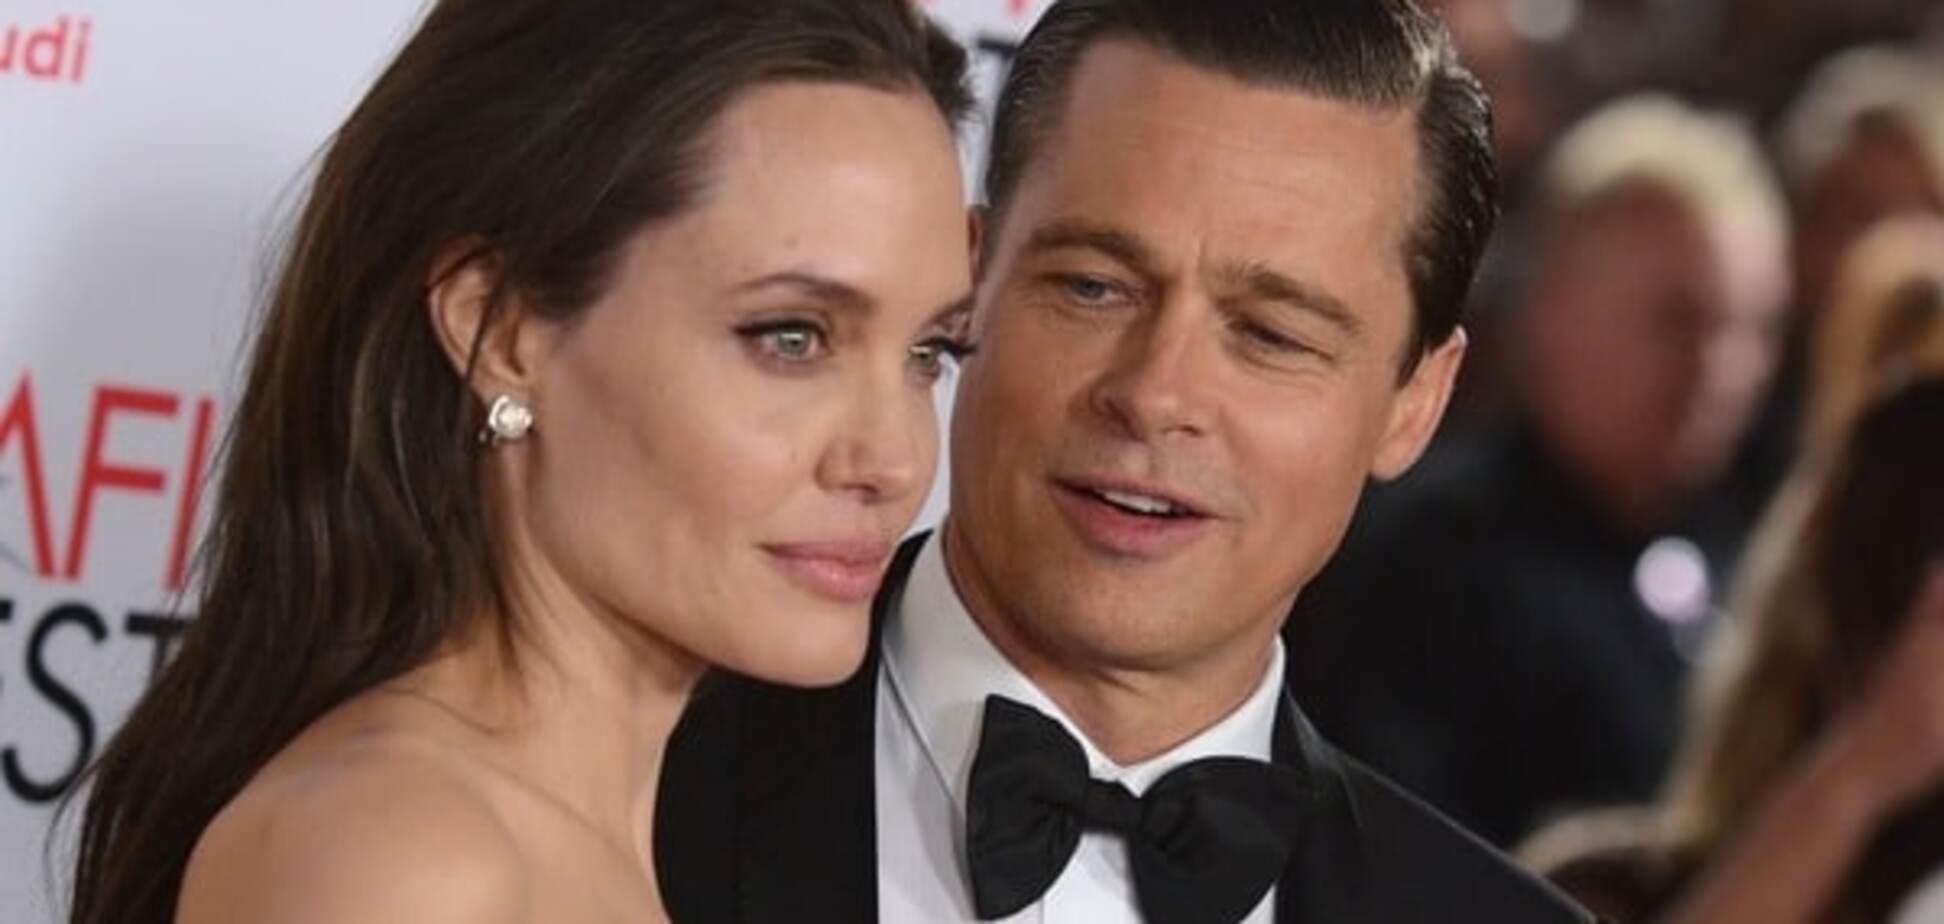 Брэд и Анджелина: развод на 400 миллионов долларов - In Touch Weekly